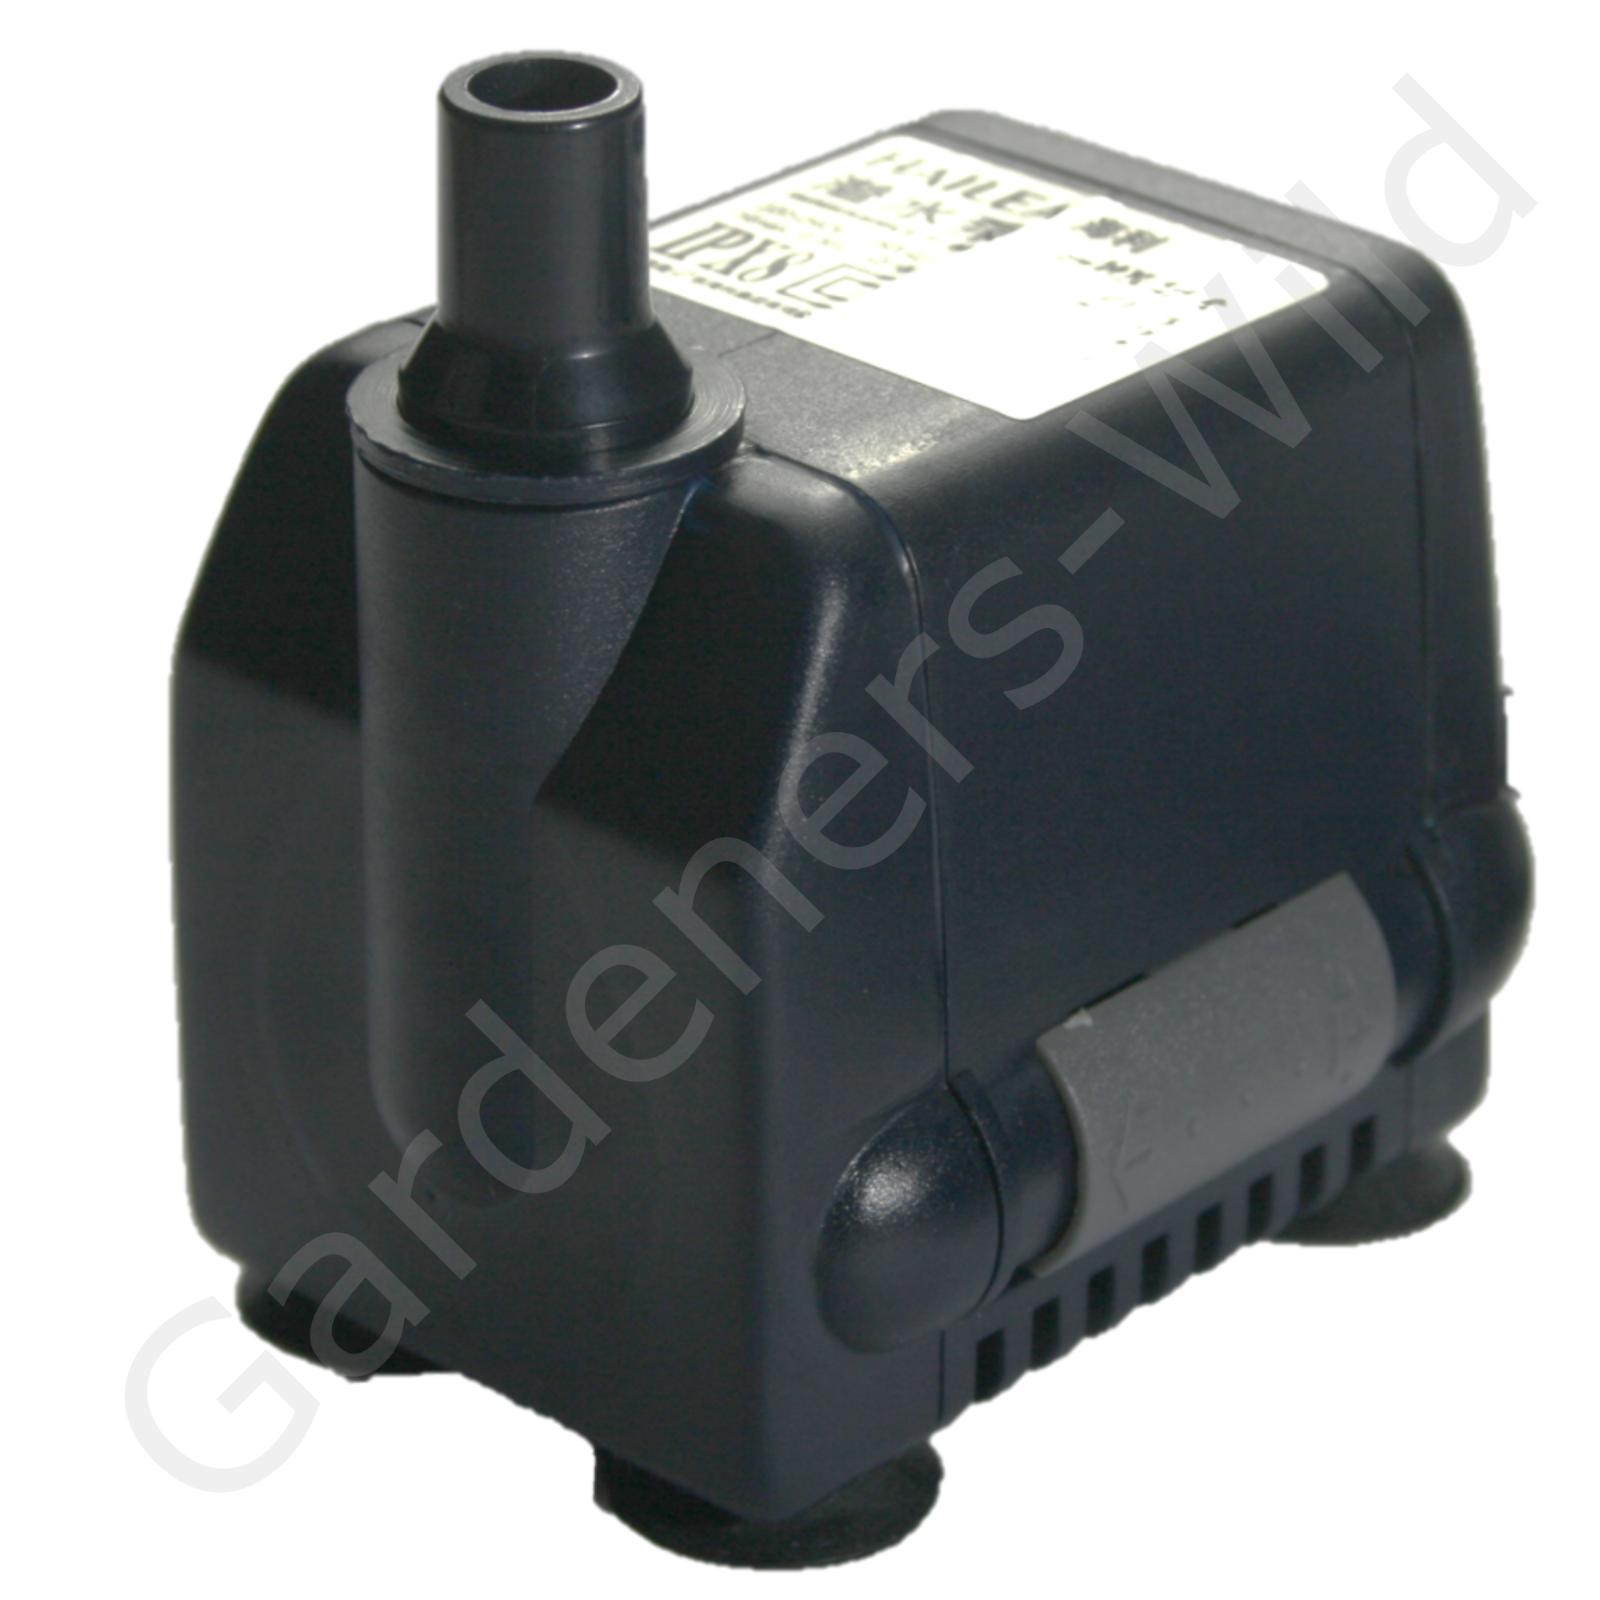 Hailea Tauchpumpe HX-800 Regelbare Pumpe 285 l//h max 0,5m 10x6x13cm B23-800